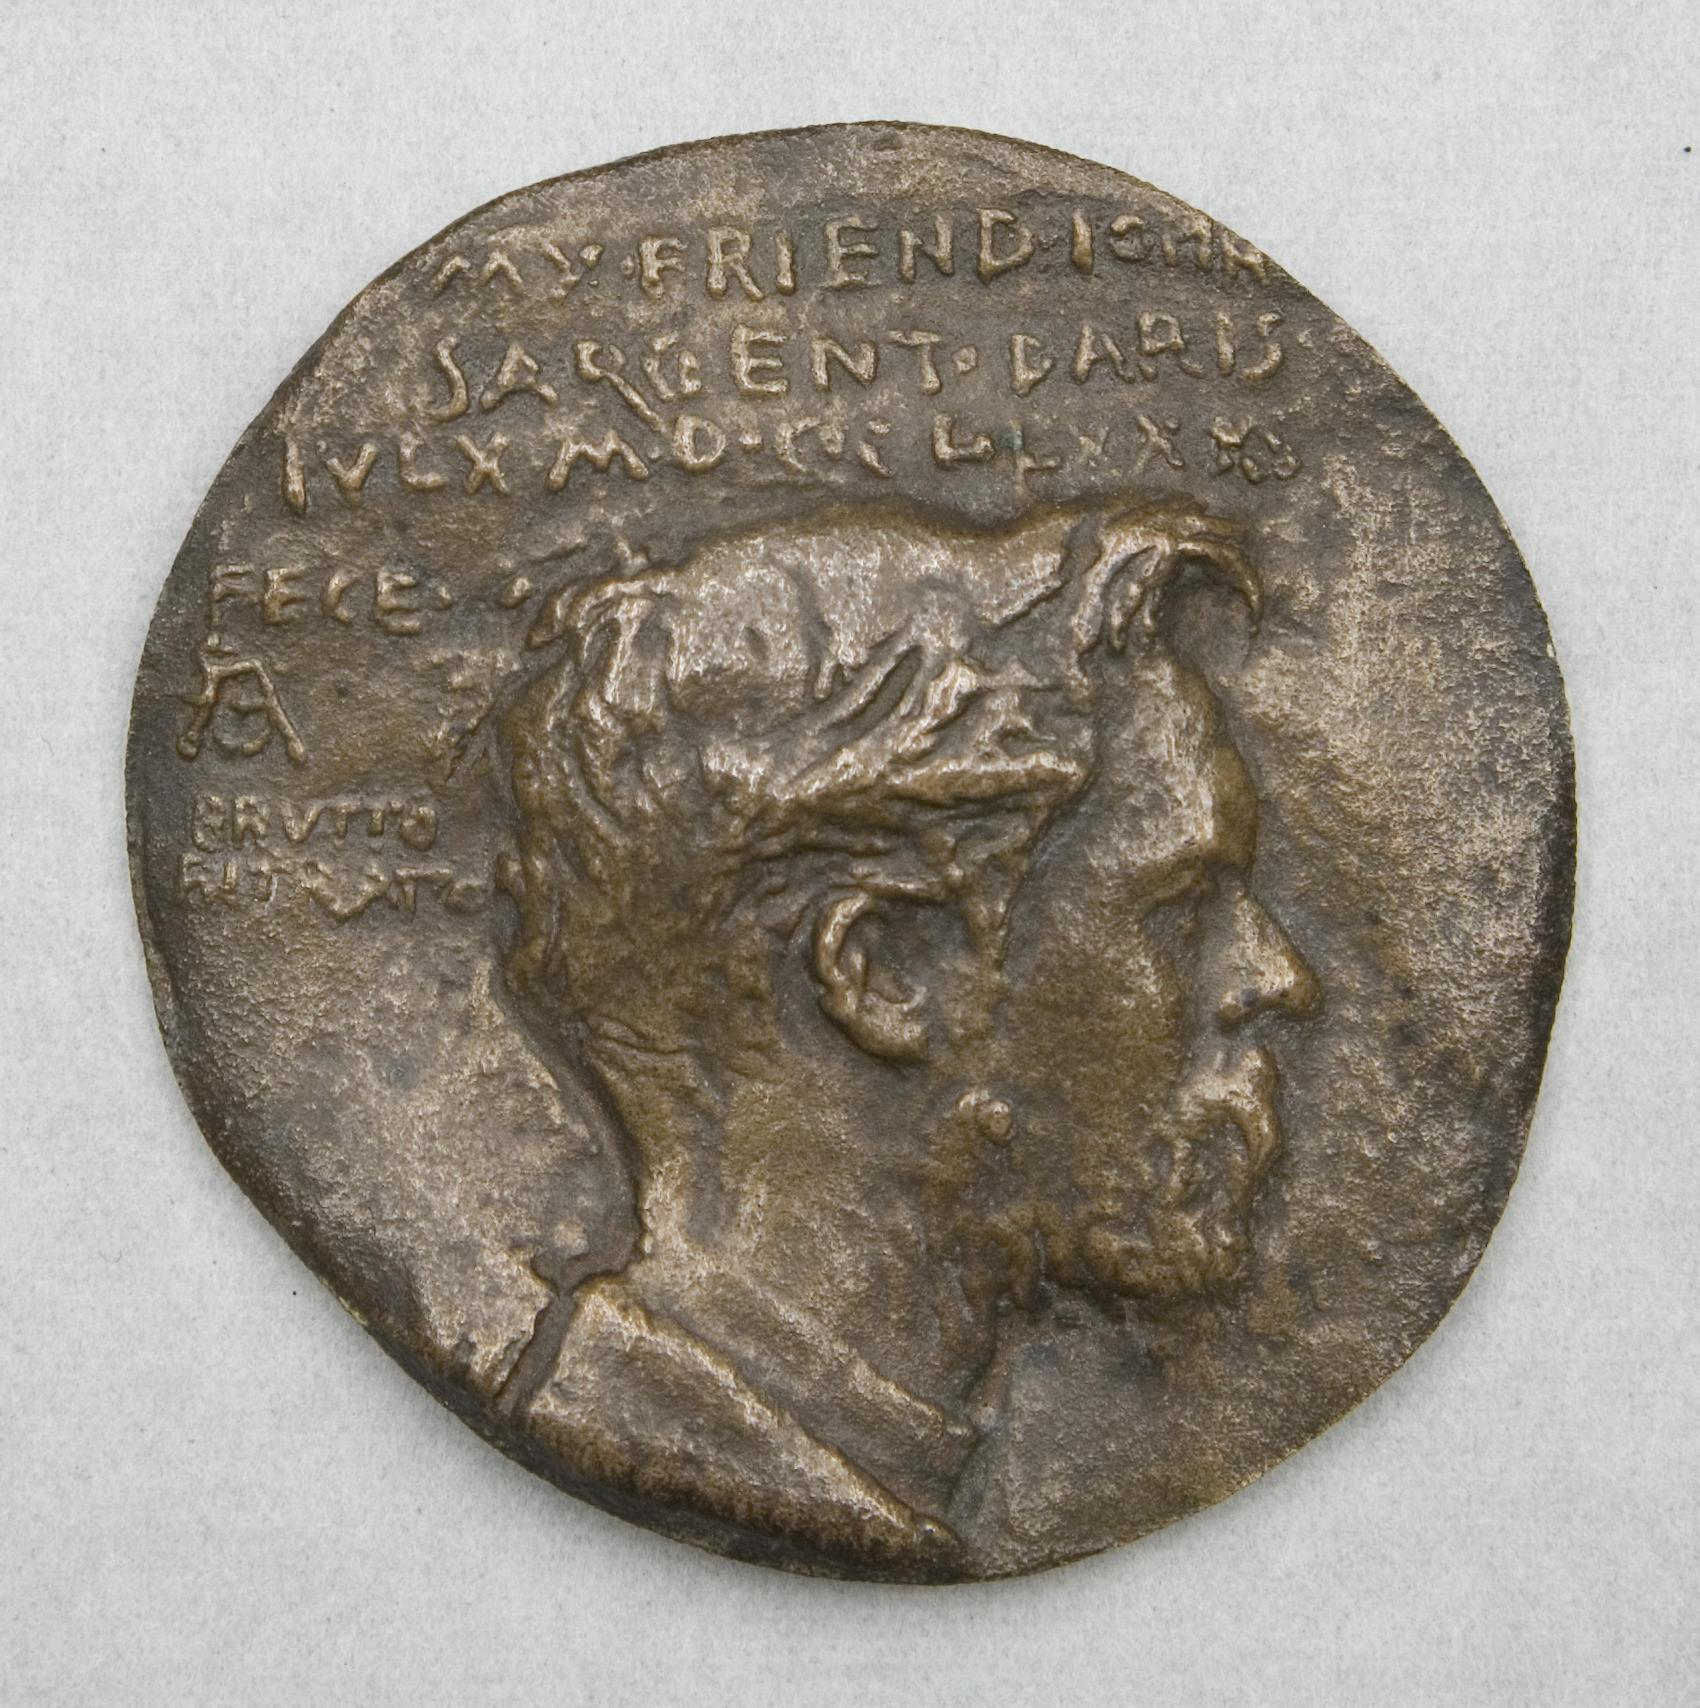 Augustus Saint-Gaudens (American, 1848-1907), Medal of John Singer Sargent (1856-1925), 1880